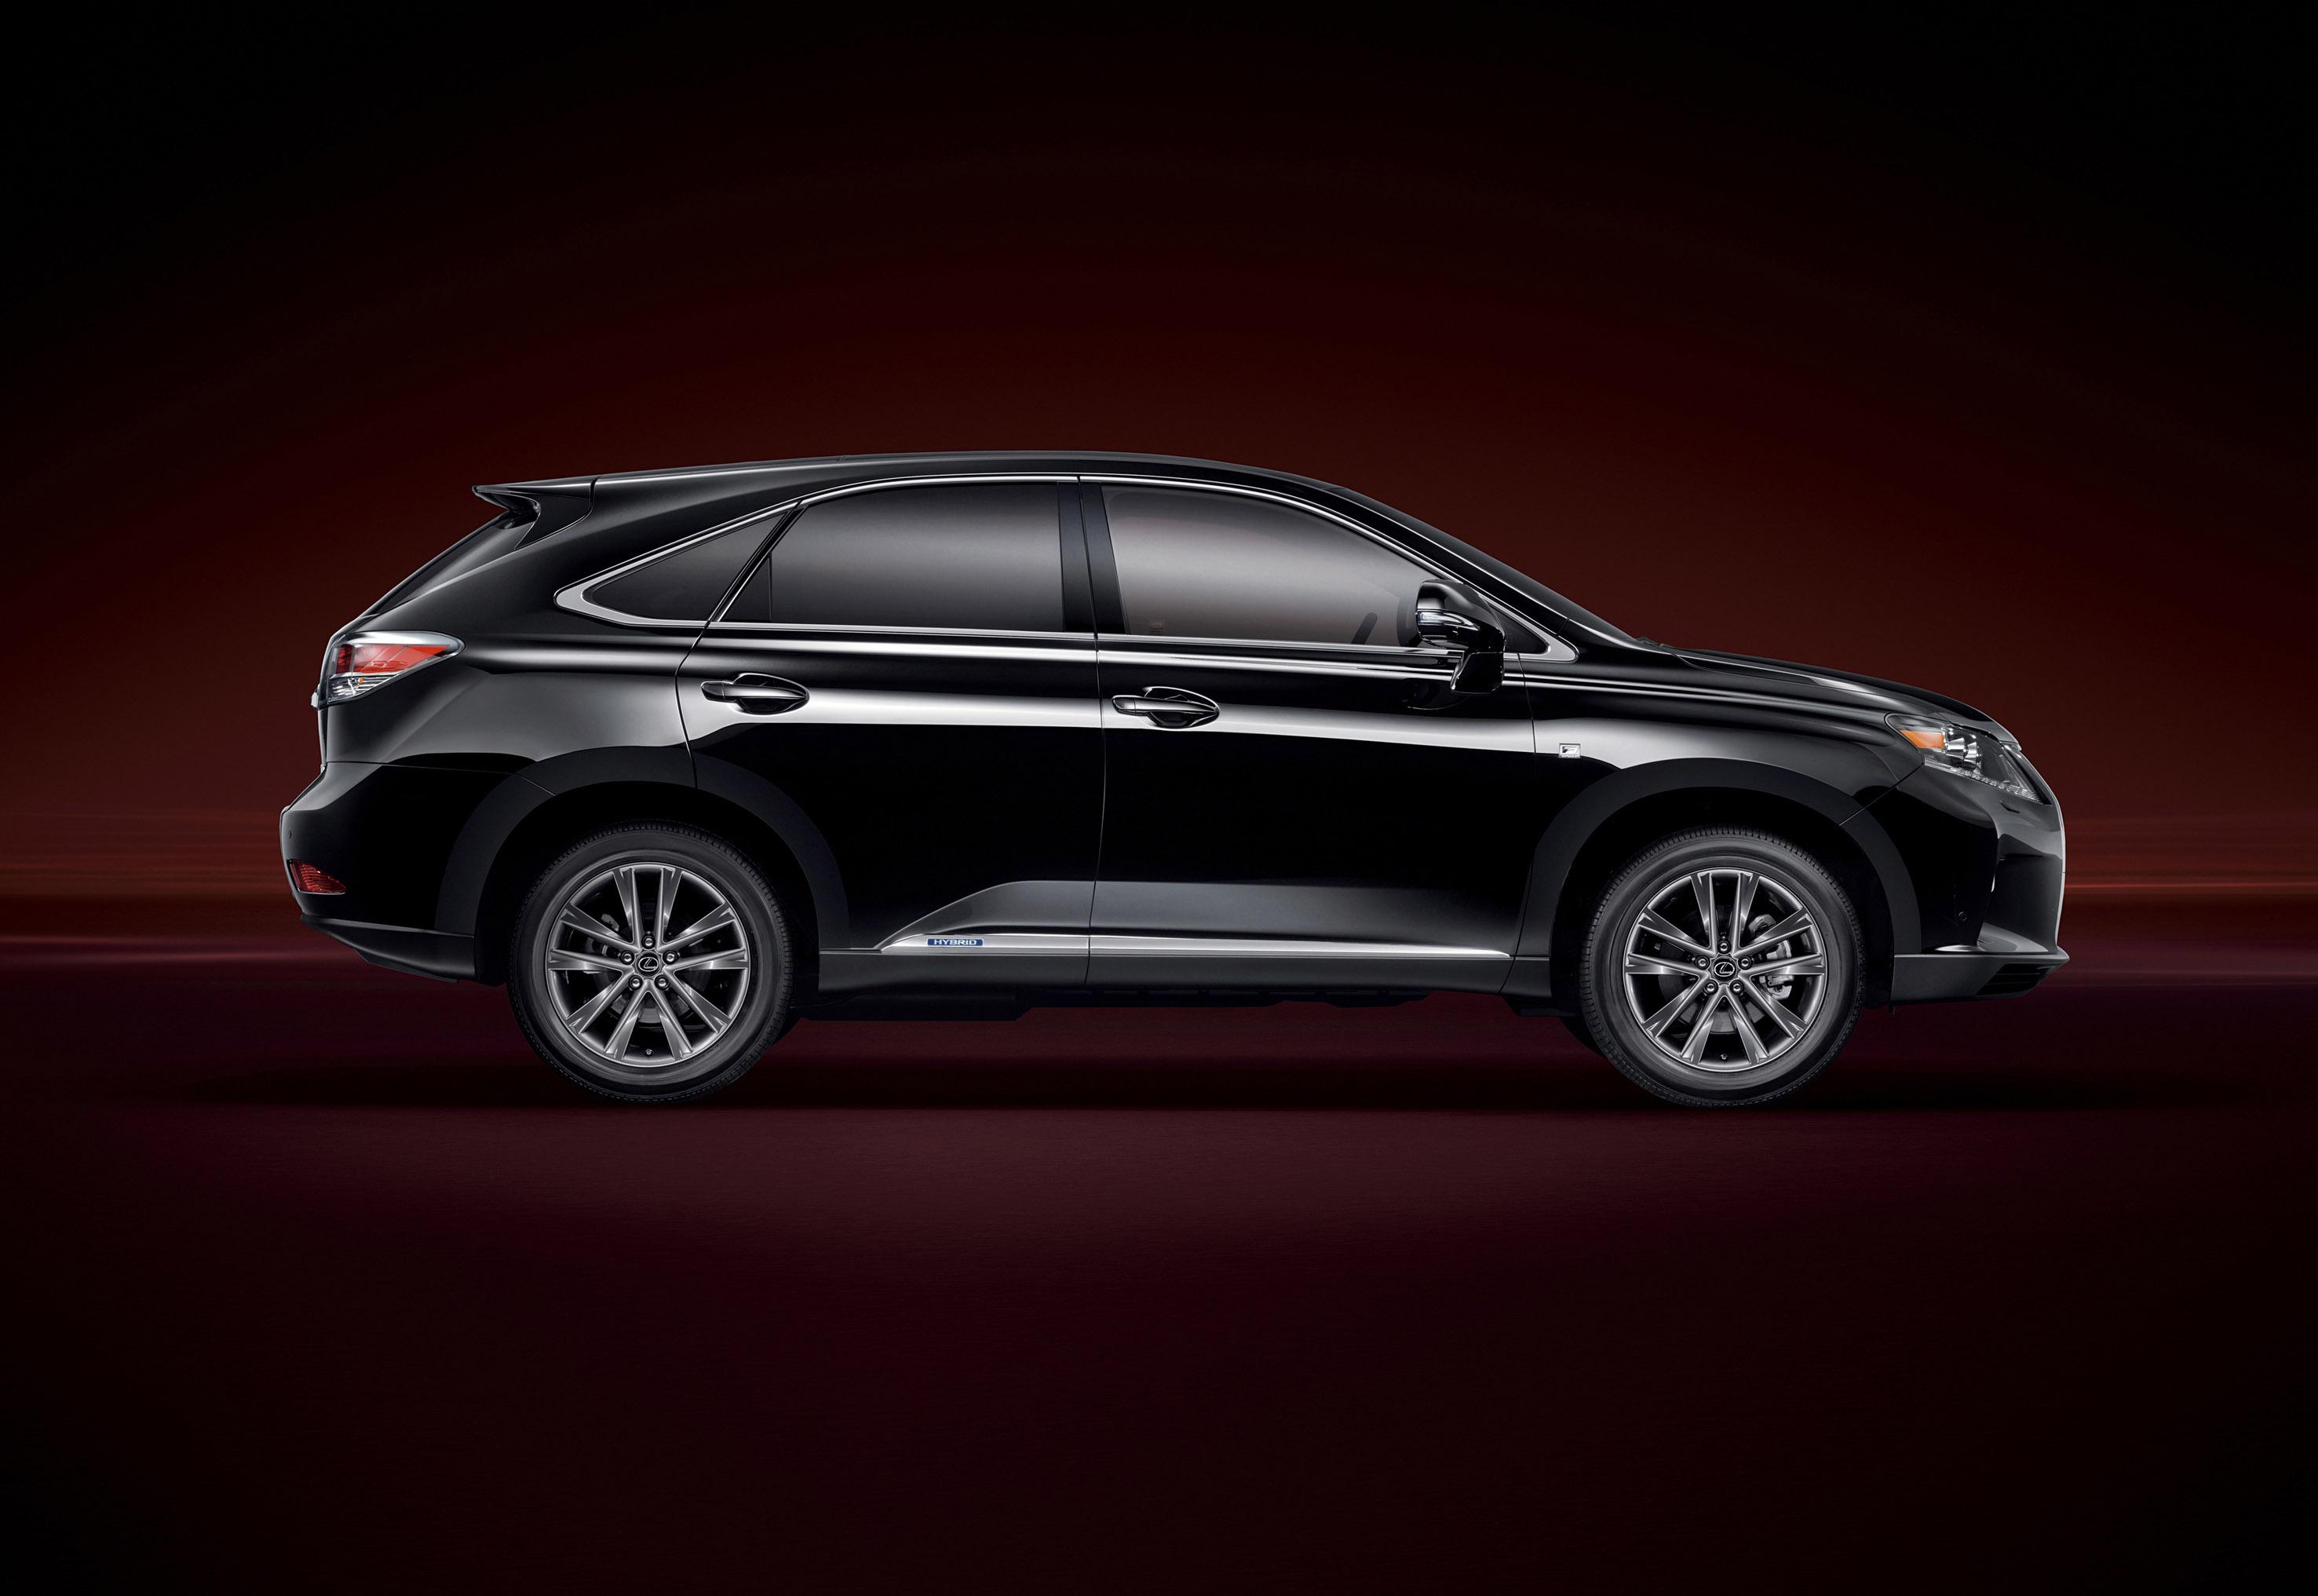 2013 Lexus Rx 450h Uk Price 163 44 845